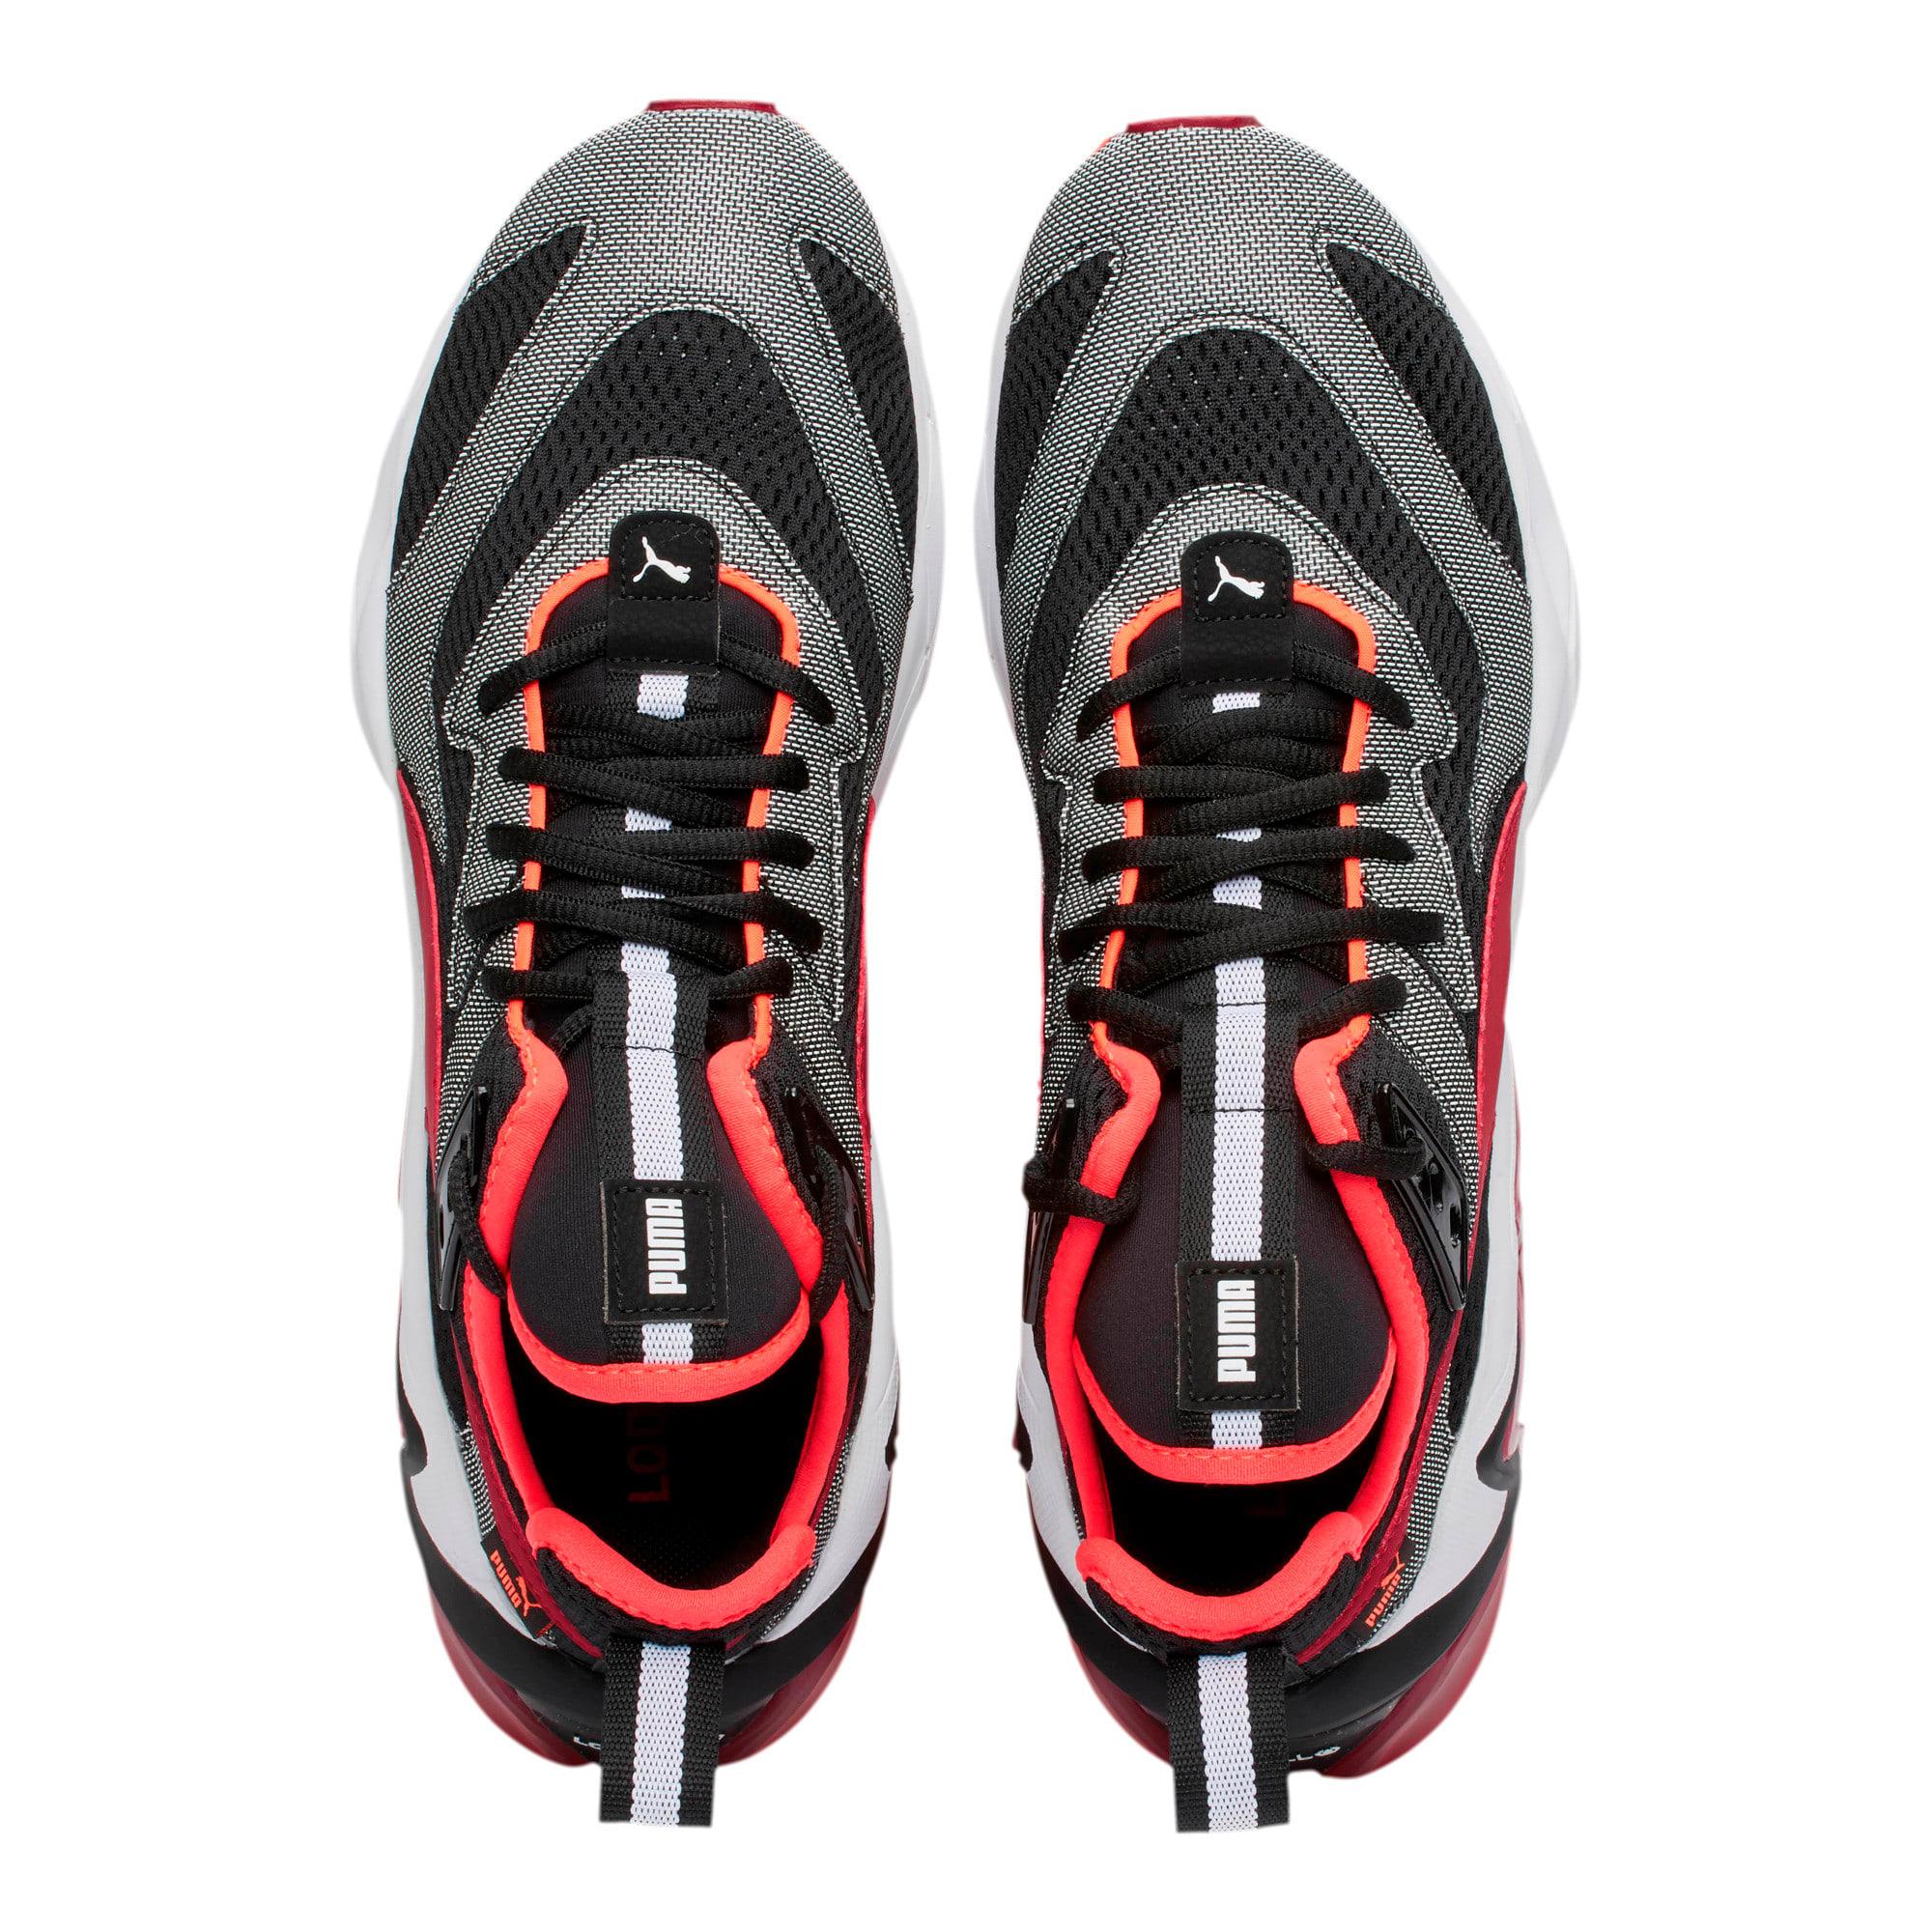 Thumbnail 7 of LQDCELL Origin Tech Men's Training Shoes, Puma Black-Rhubarb, medium